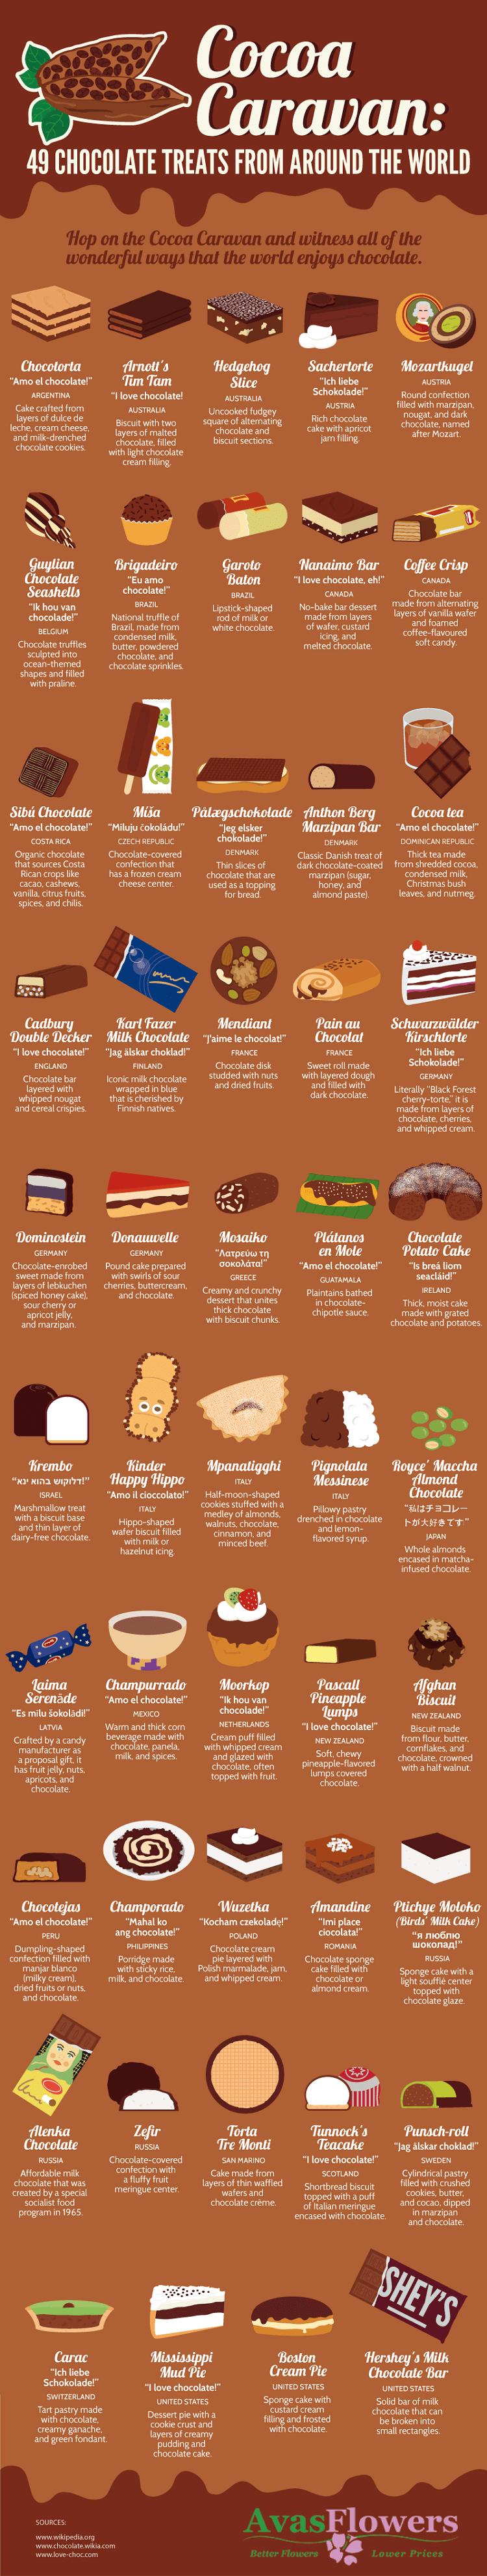 49-Chocolate-Treats